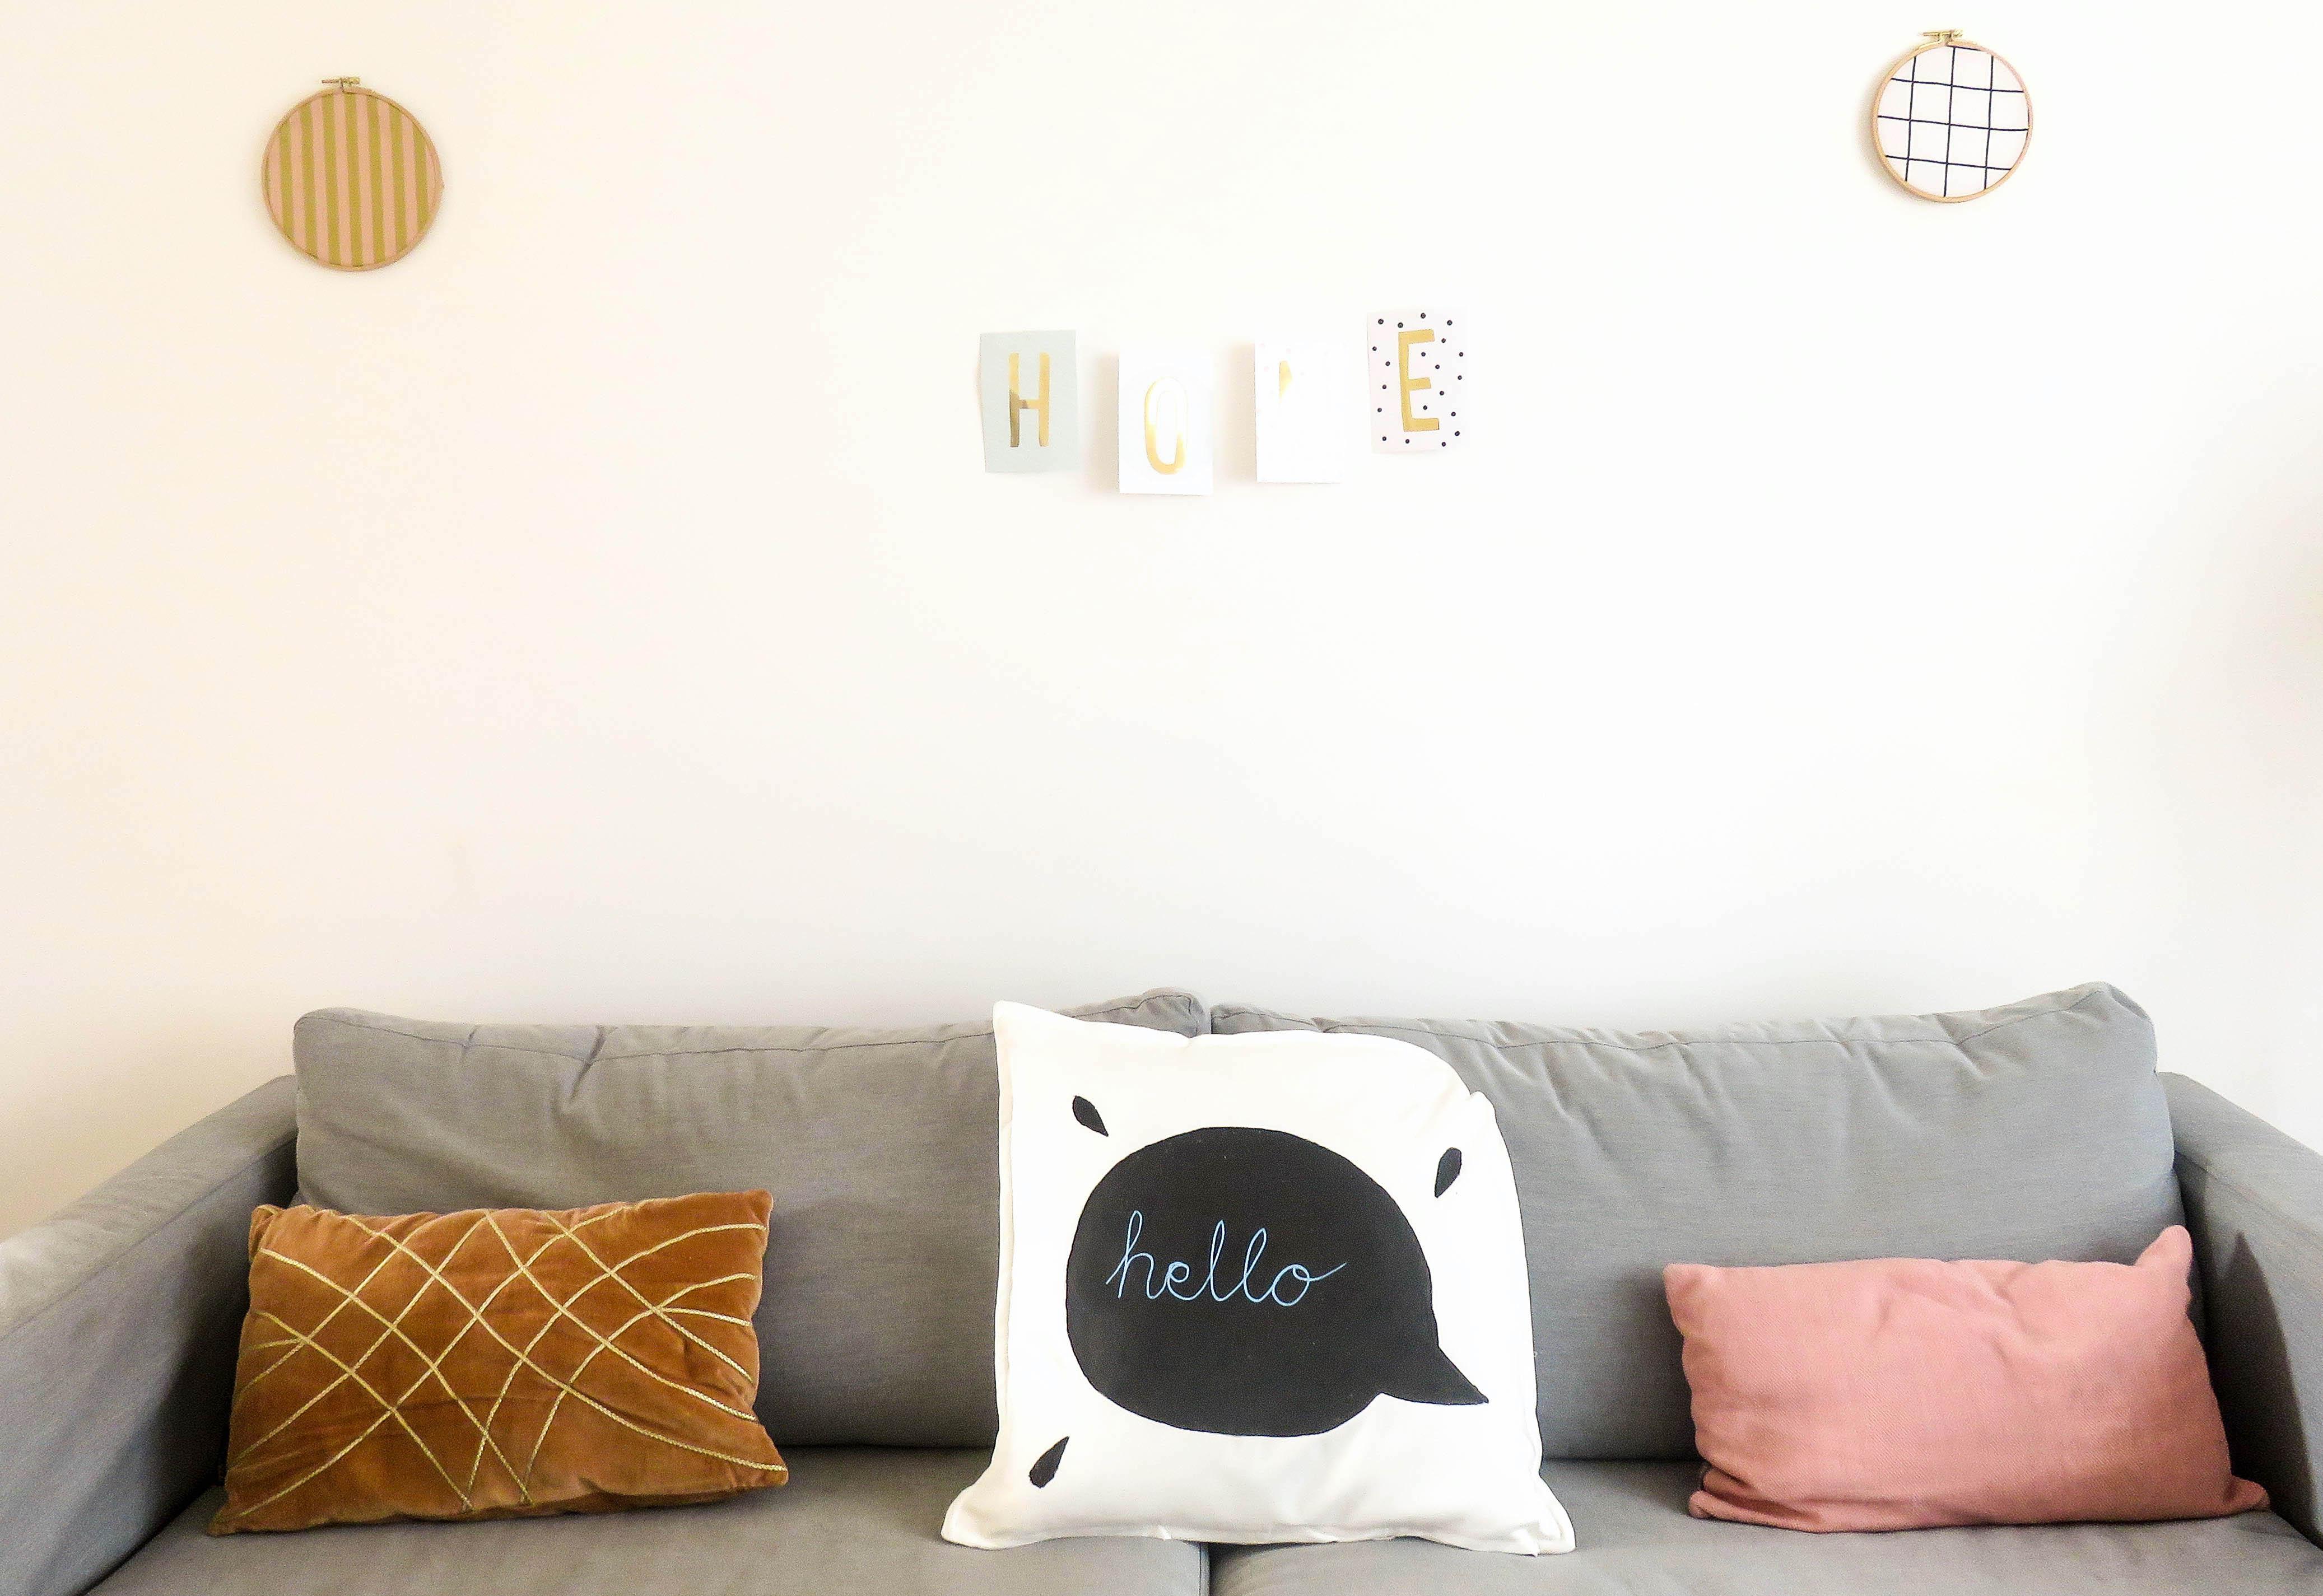 diy kissen mit tafelfarbe bonbont te. Black Bedroom Furniture Sets. Home Design Ideas